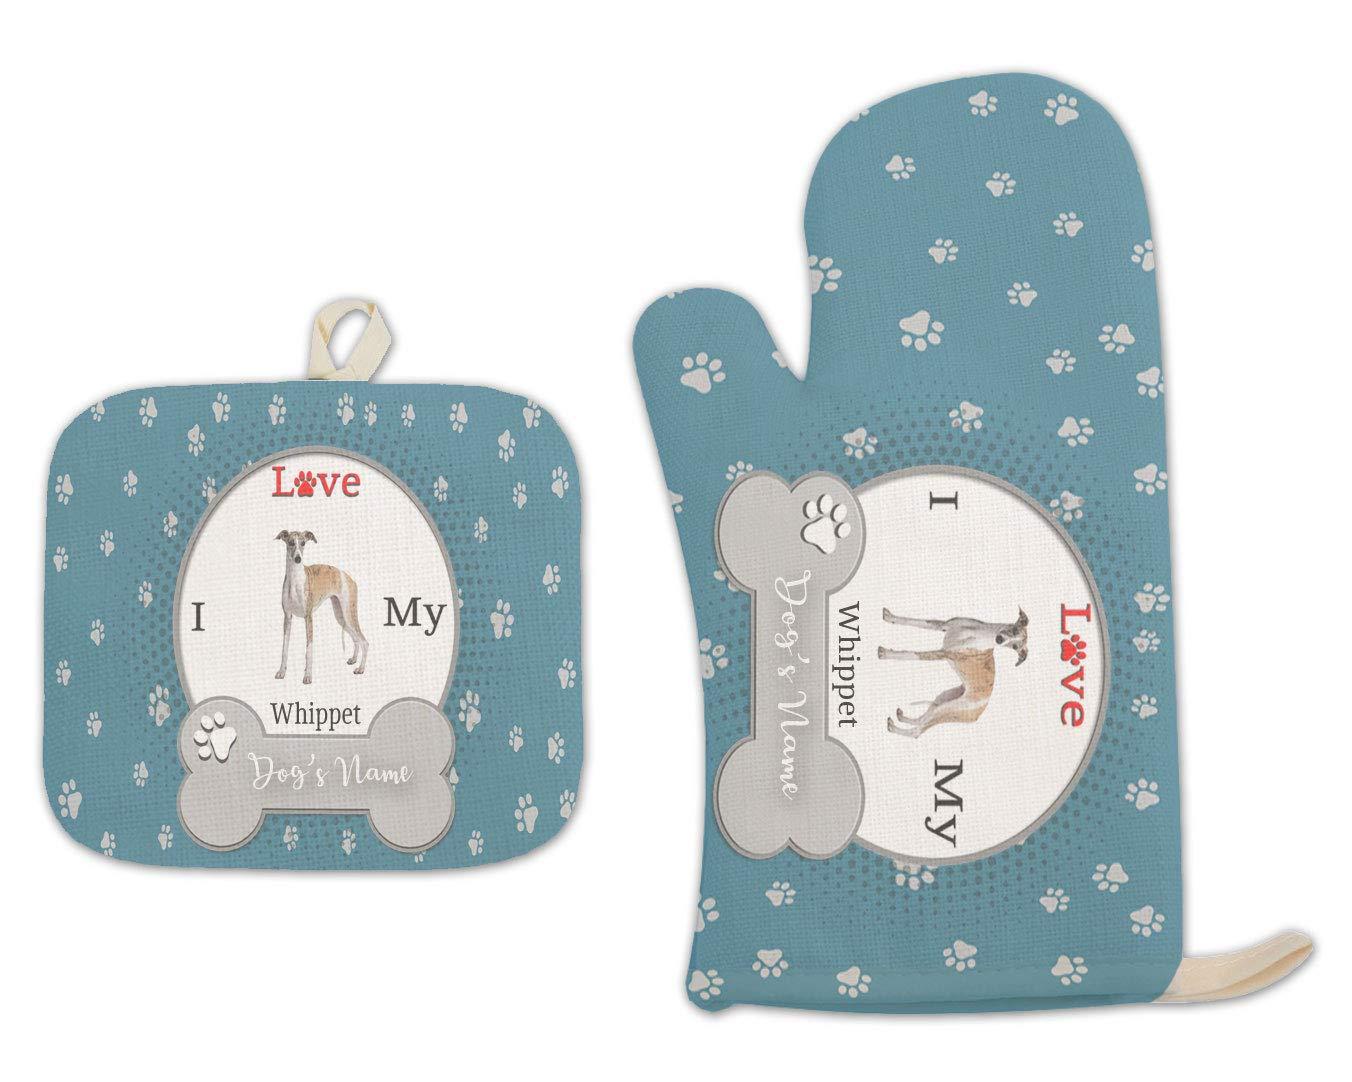 Bleu Reign BRGiftShop Personalized Custom Name I Love My Dog Whippet Linen Oven Mitt and Potholder Set